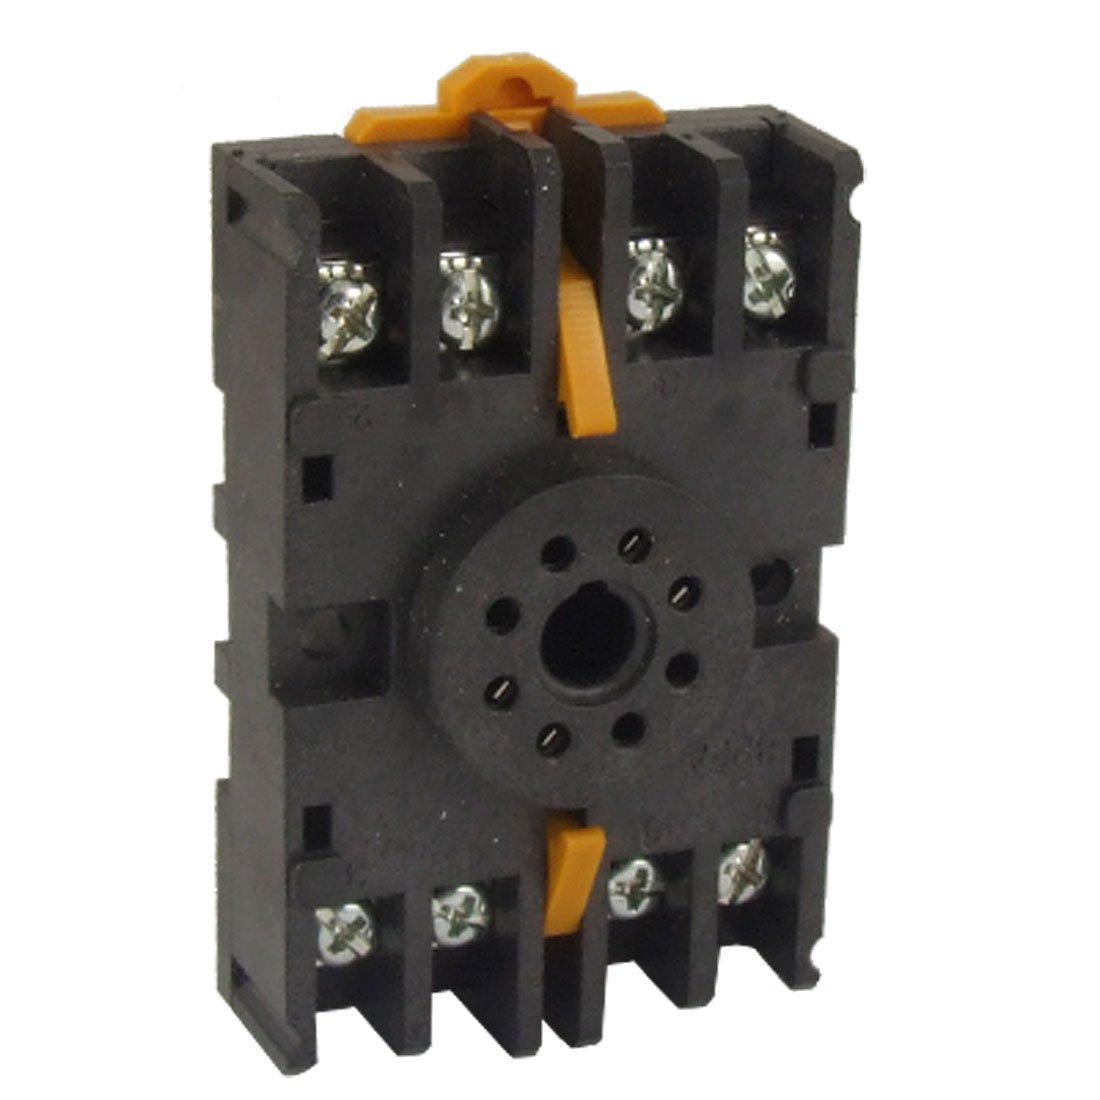 Amazoncom DIN Mount Relays Controls  Indicators Industrial - Dpdt relay buy